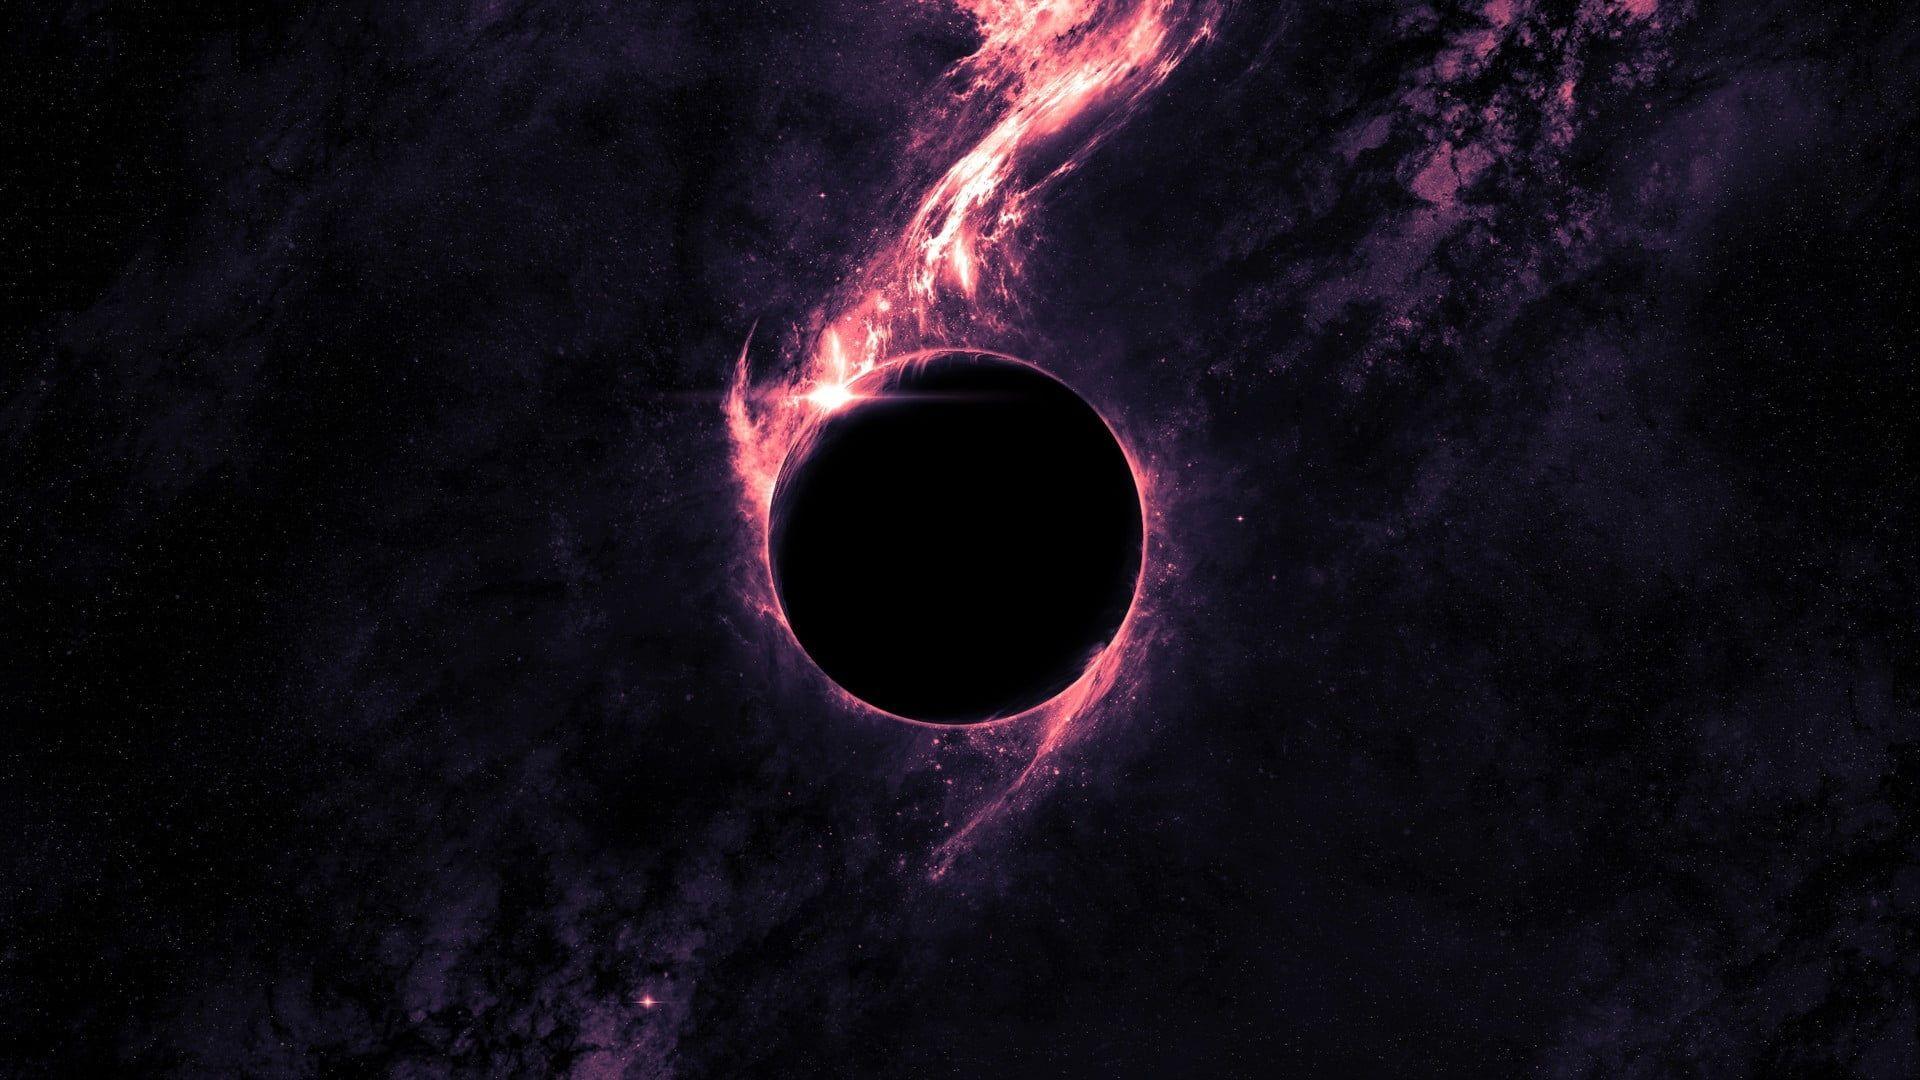 Kid Smiling Black Hole 1920x1080 In 2020 Black Hole Wallpaper Dark Purple Wallpaper Black Hole